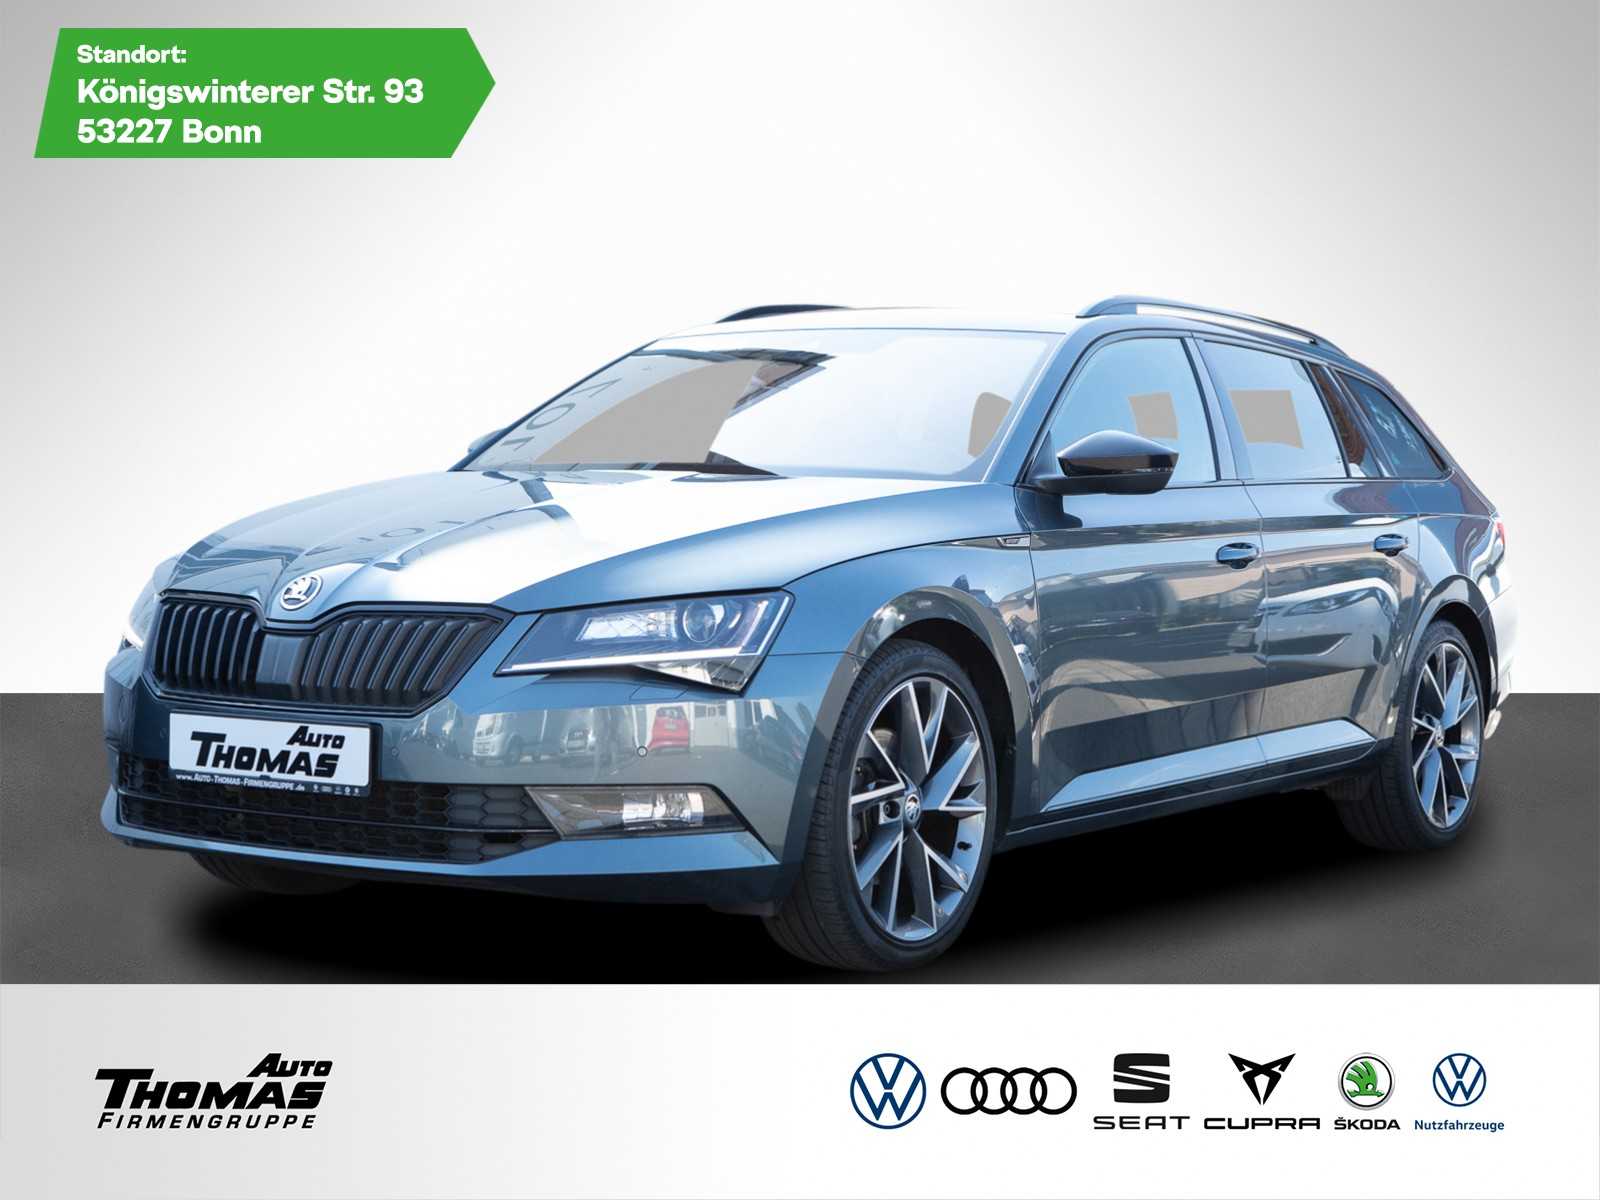 Skoda Superb III Combi Sportline 2.0 TDI DSG *XEN*AHK*, Jahr 2017, Diesel